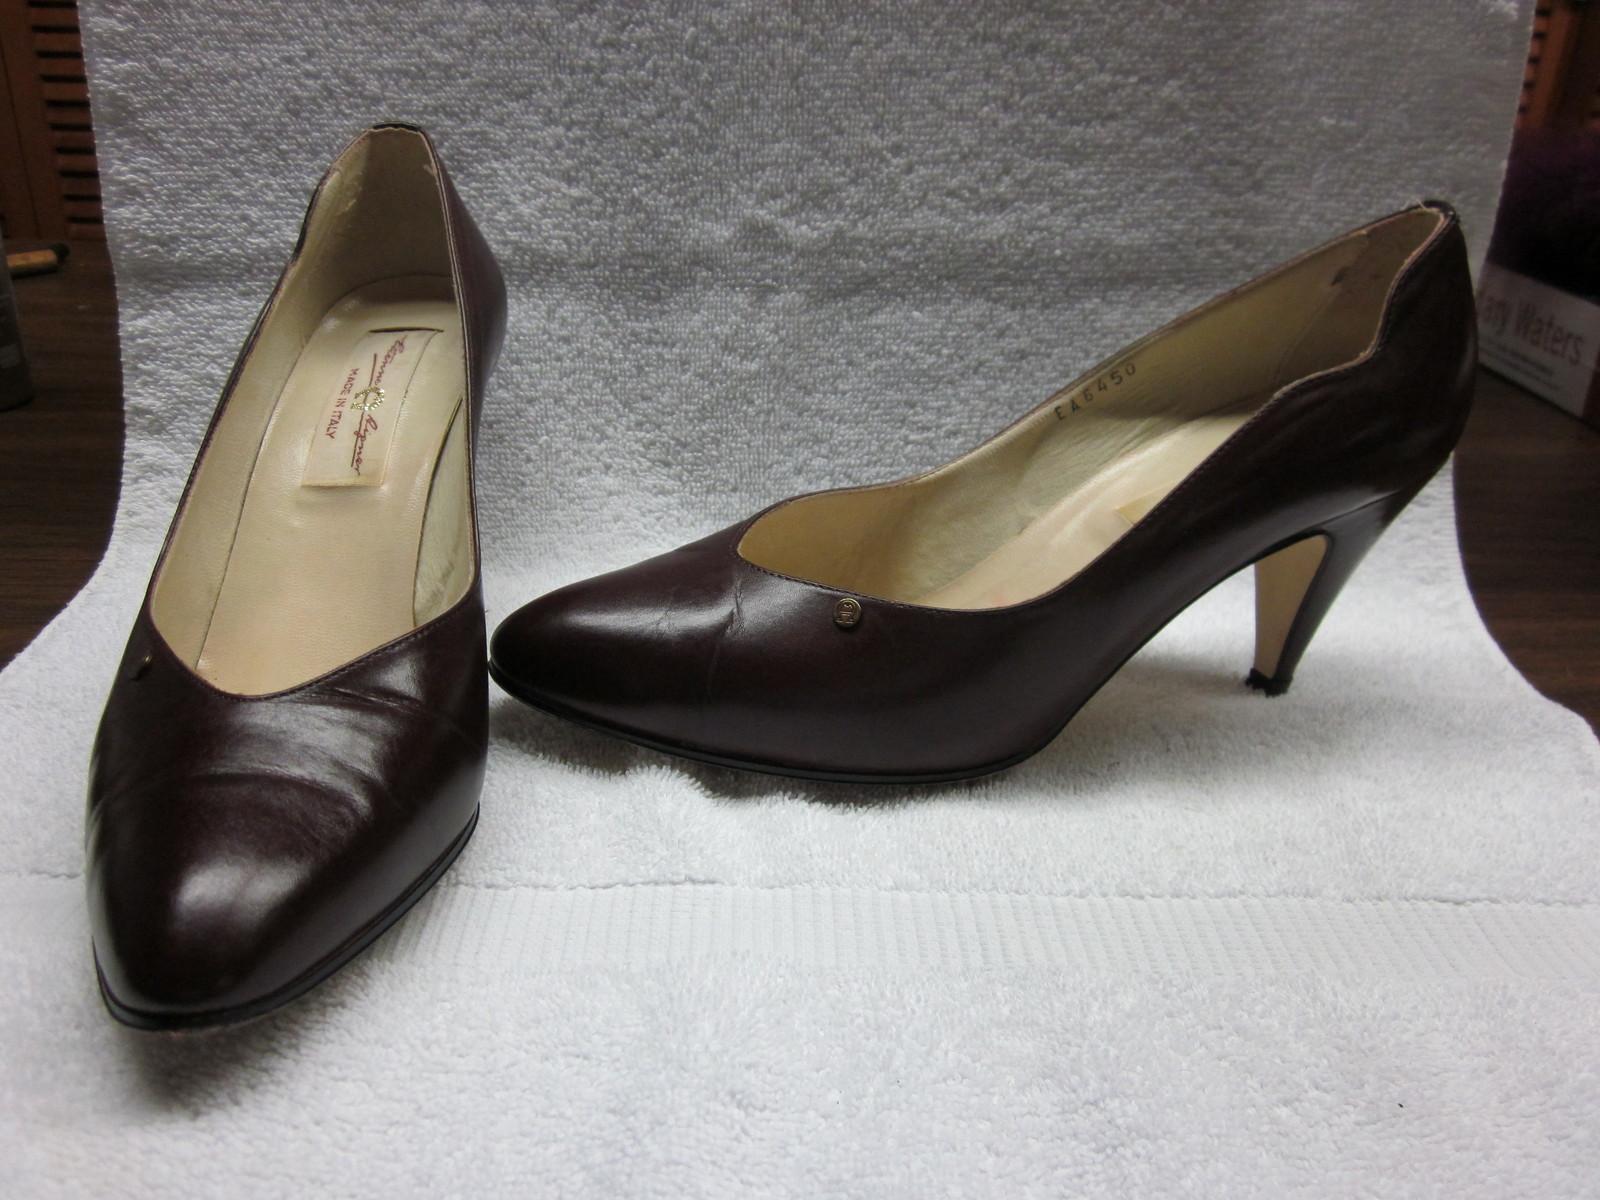 ae78facffa6 Women s Etienne Aigner Signature Calf Heels and 49 similar items. Img 1128